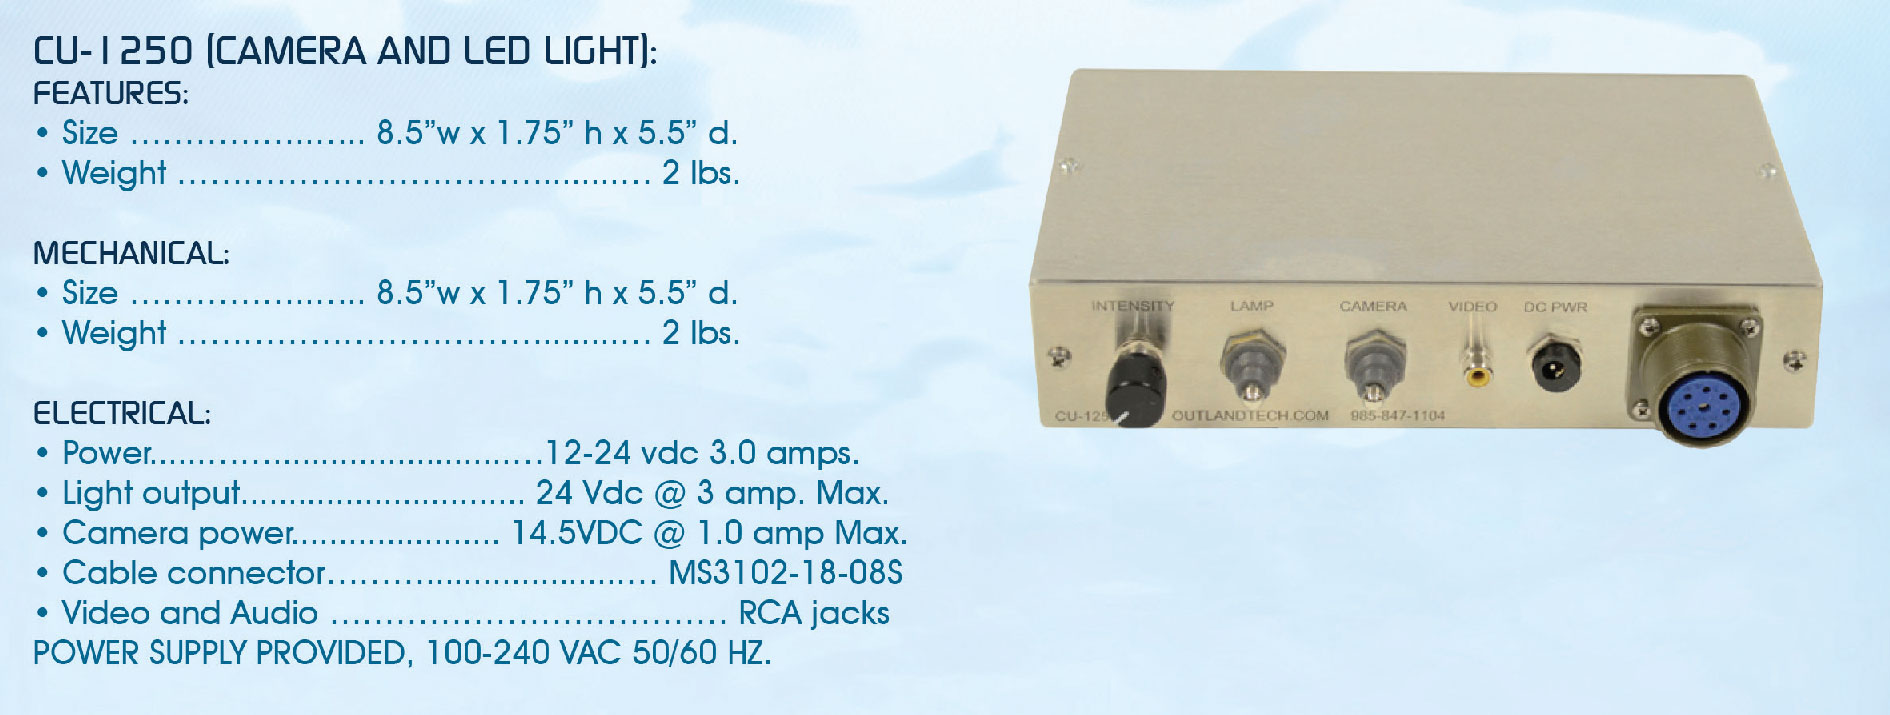 lights & cameras power supply